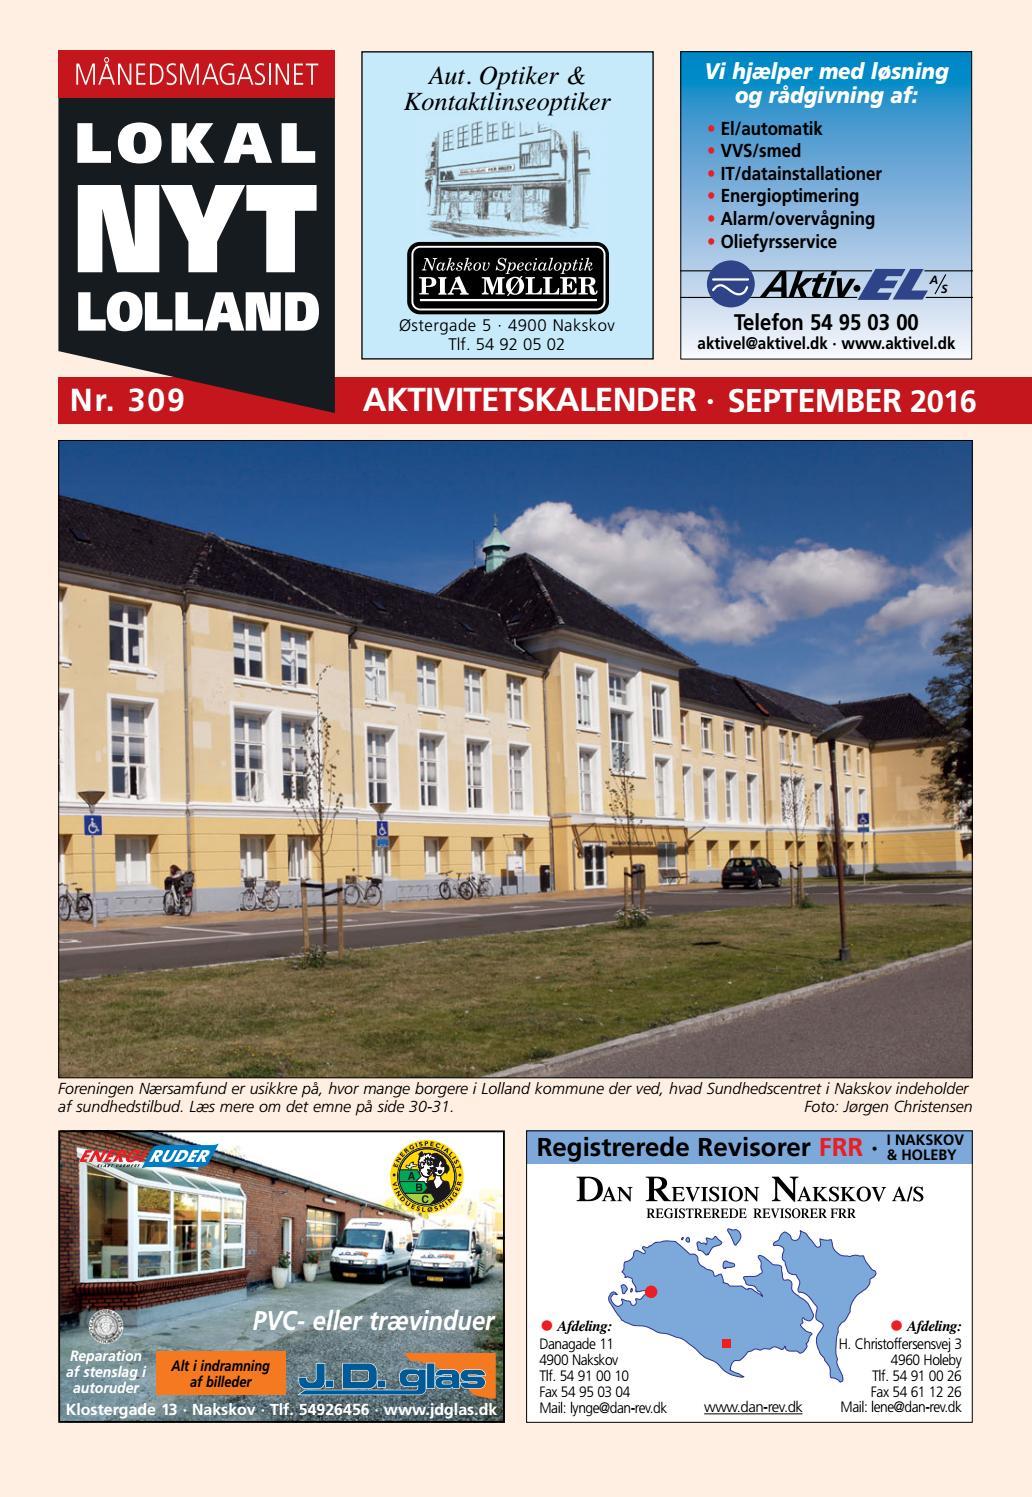 Lokal Nyt Lolland September 2016 By Trendyweb Issuu